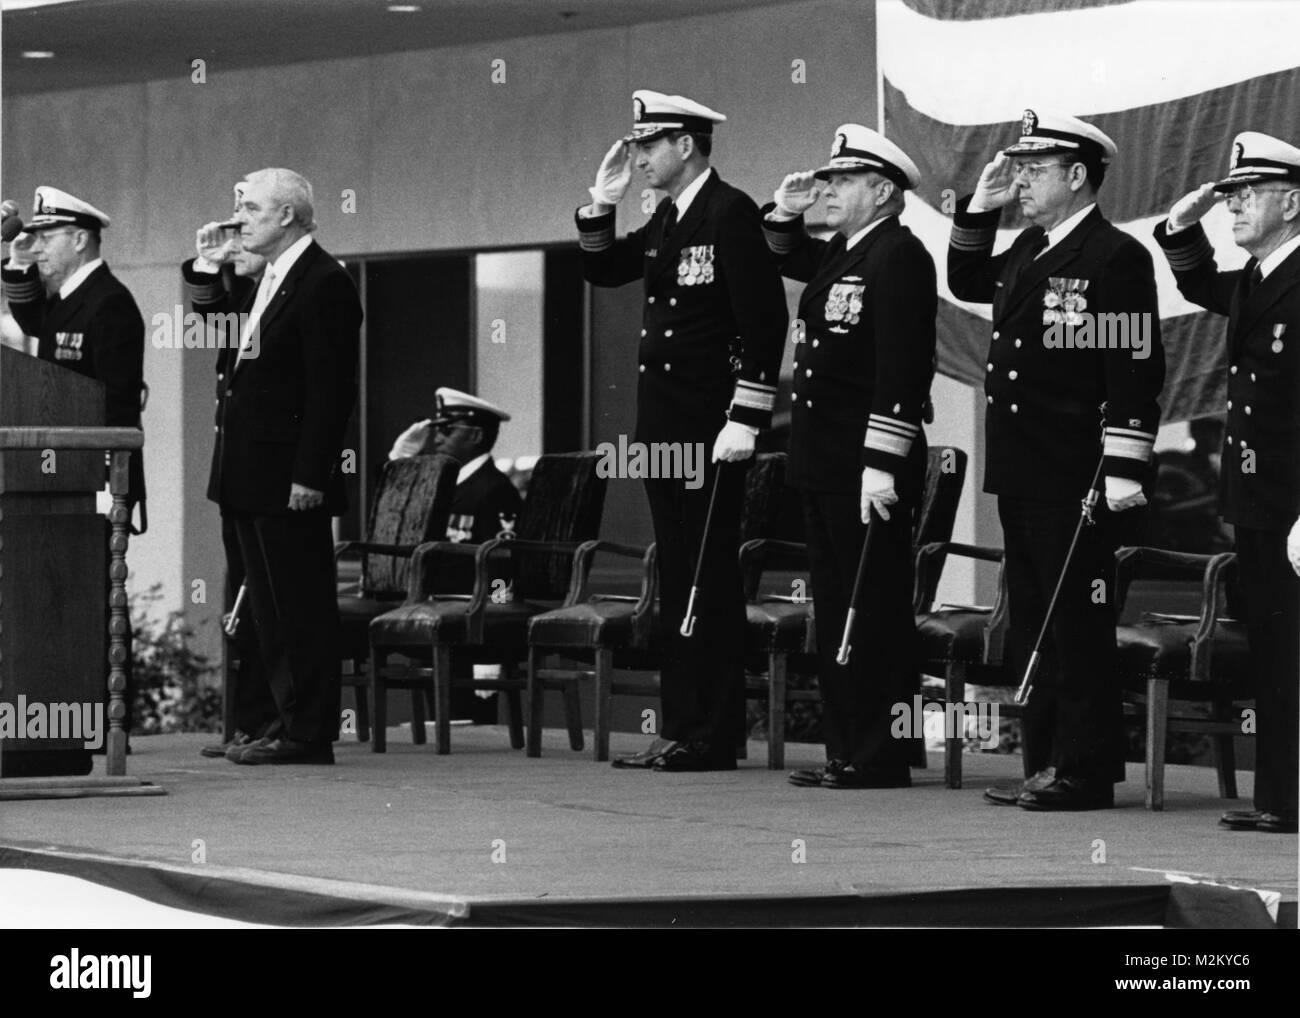 09-5054-063 par NavyMedicine Photo Stock